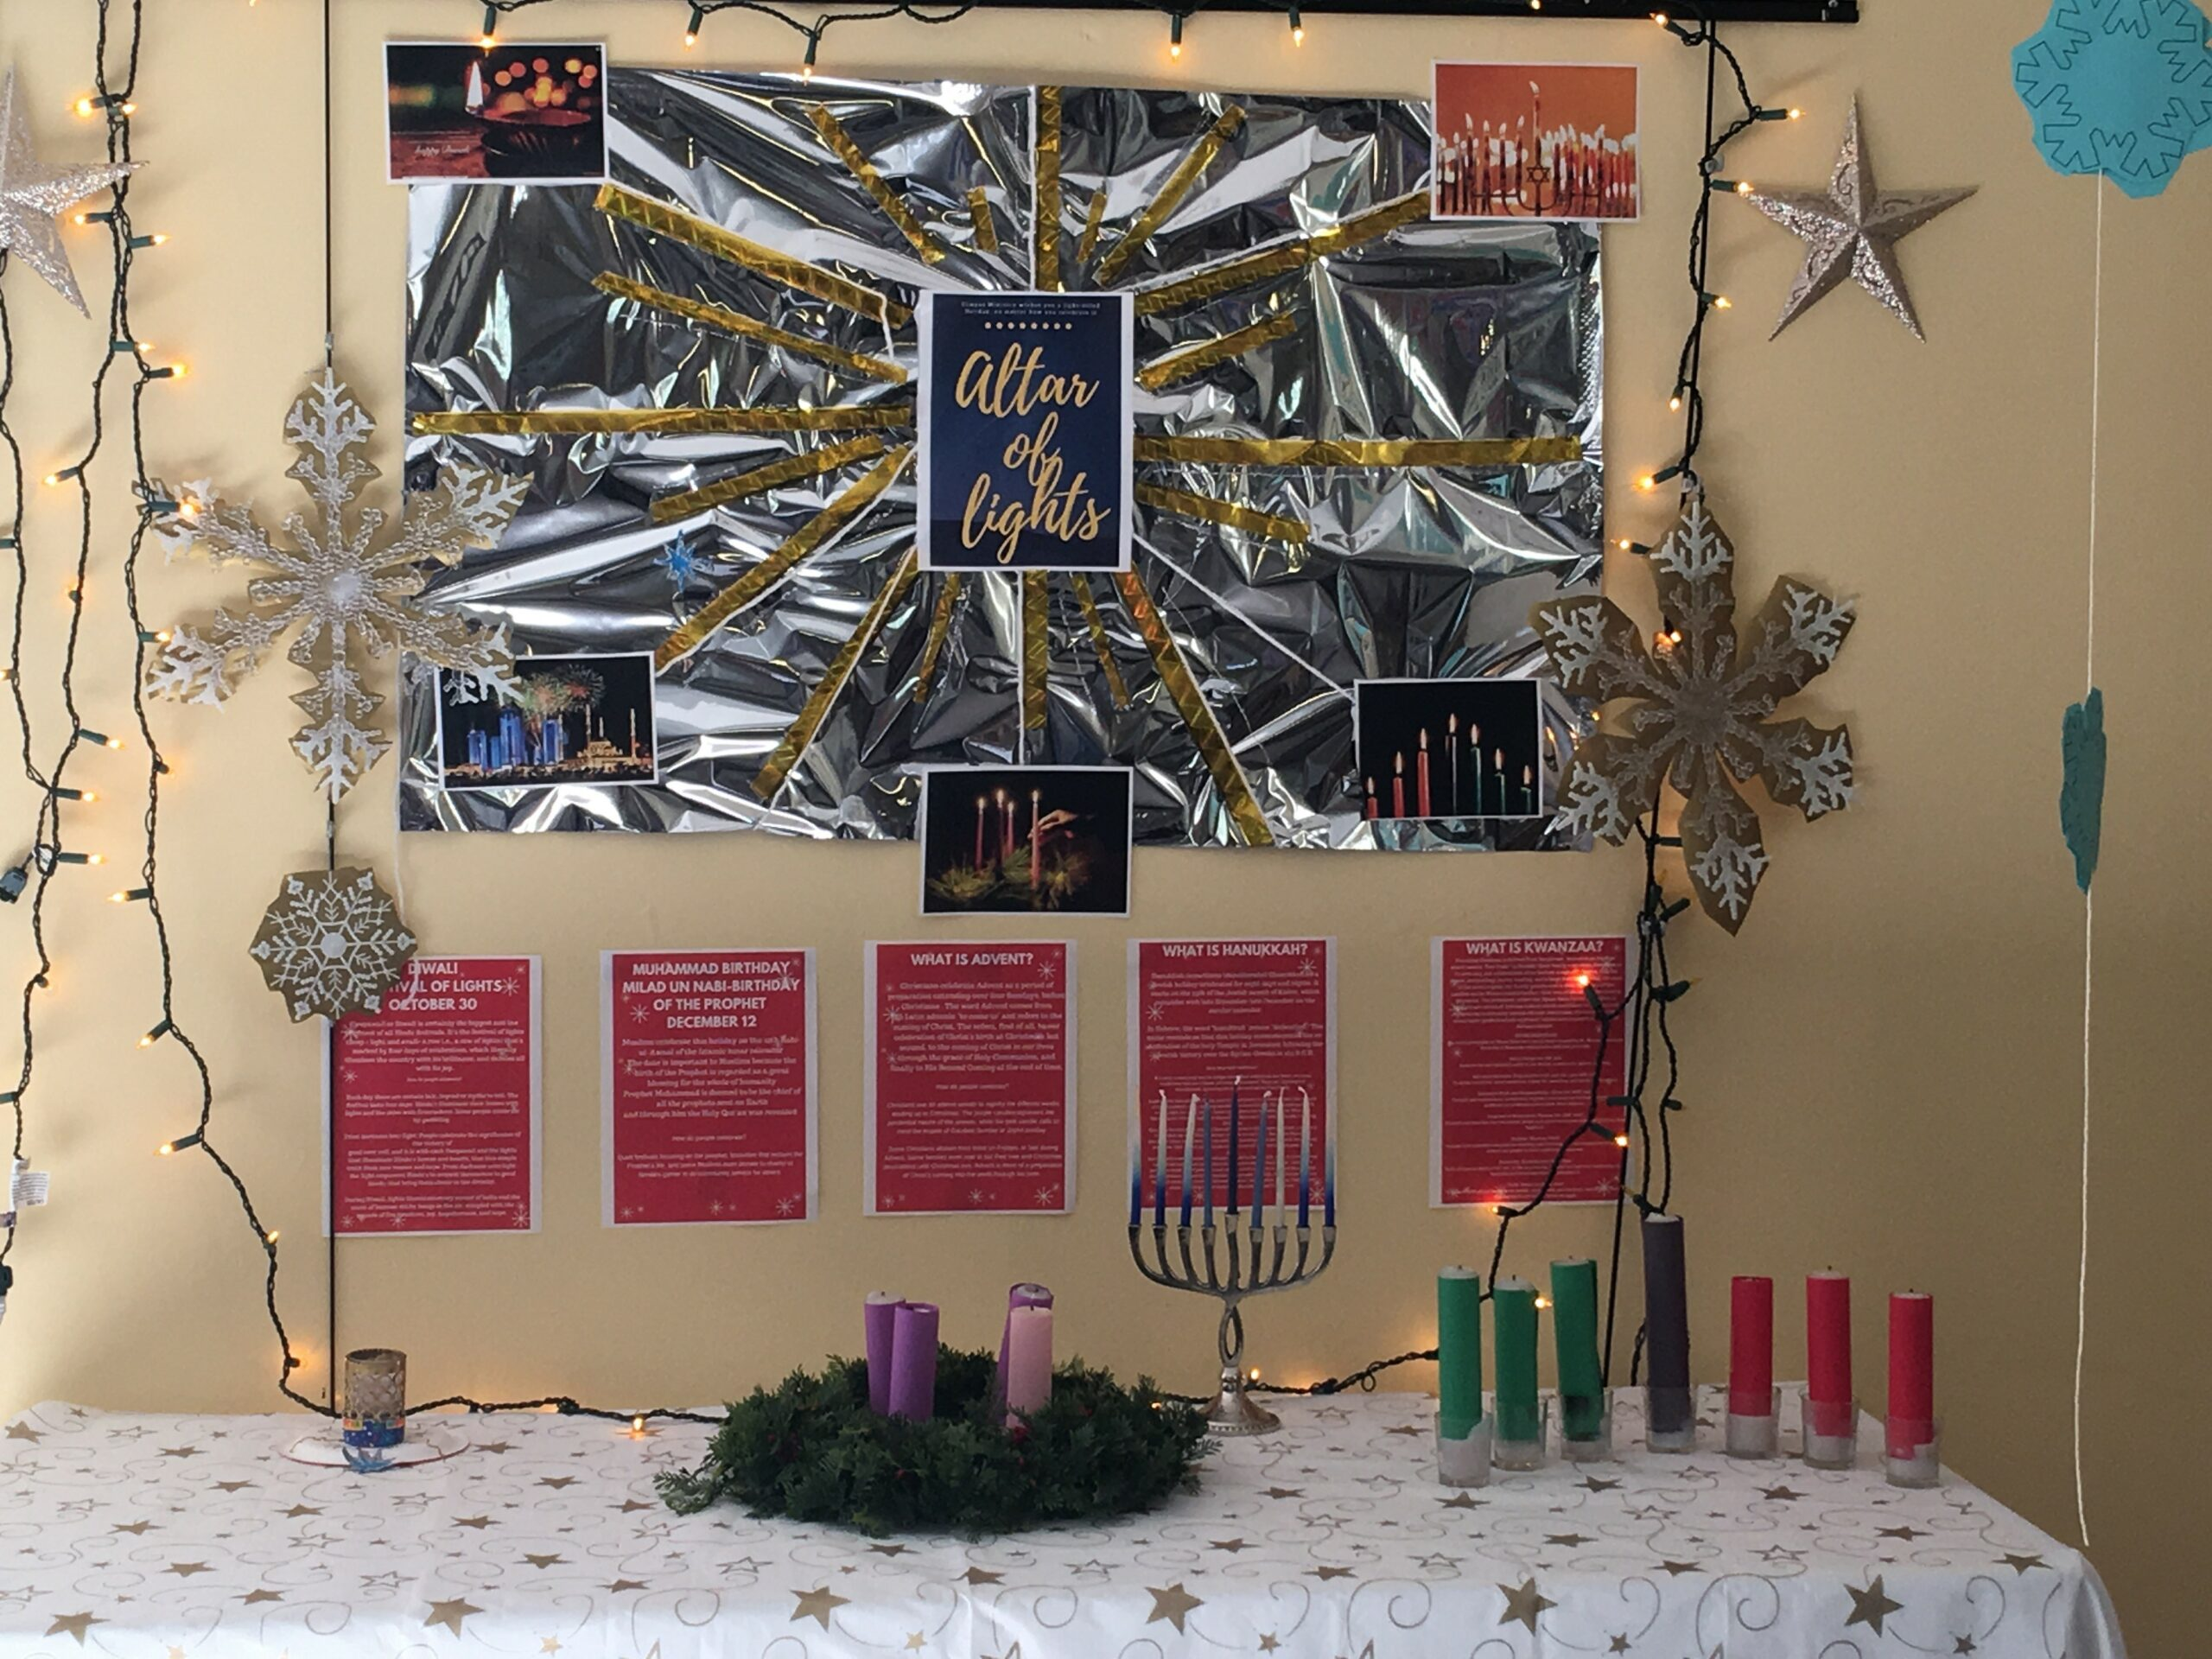 the season of lights decorations at HNU